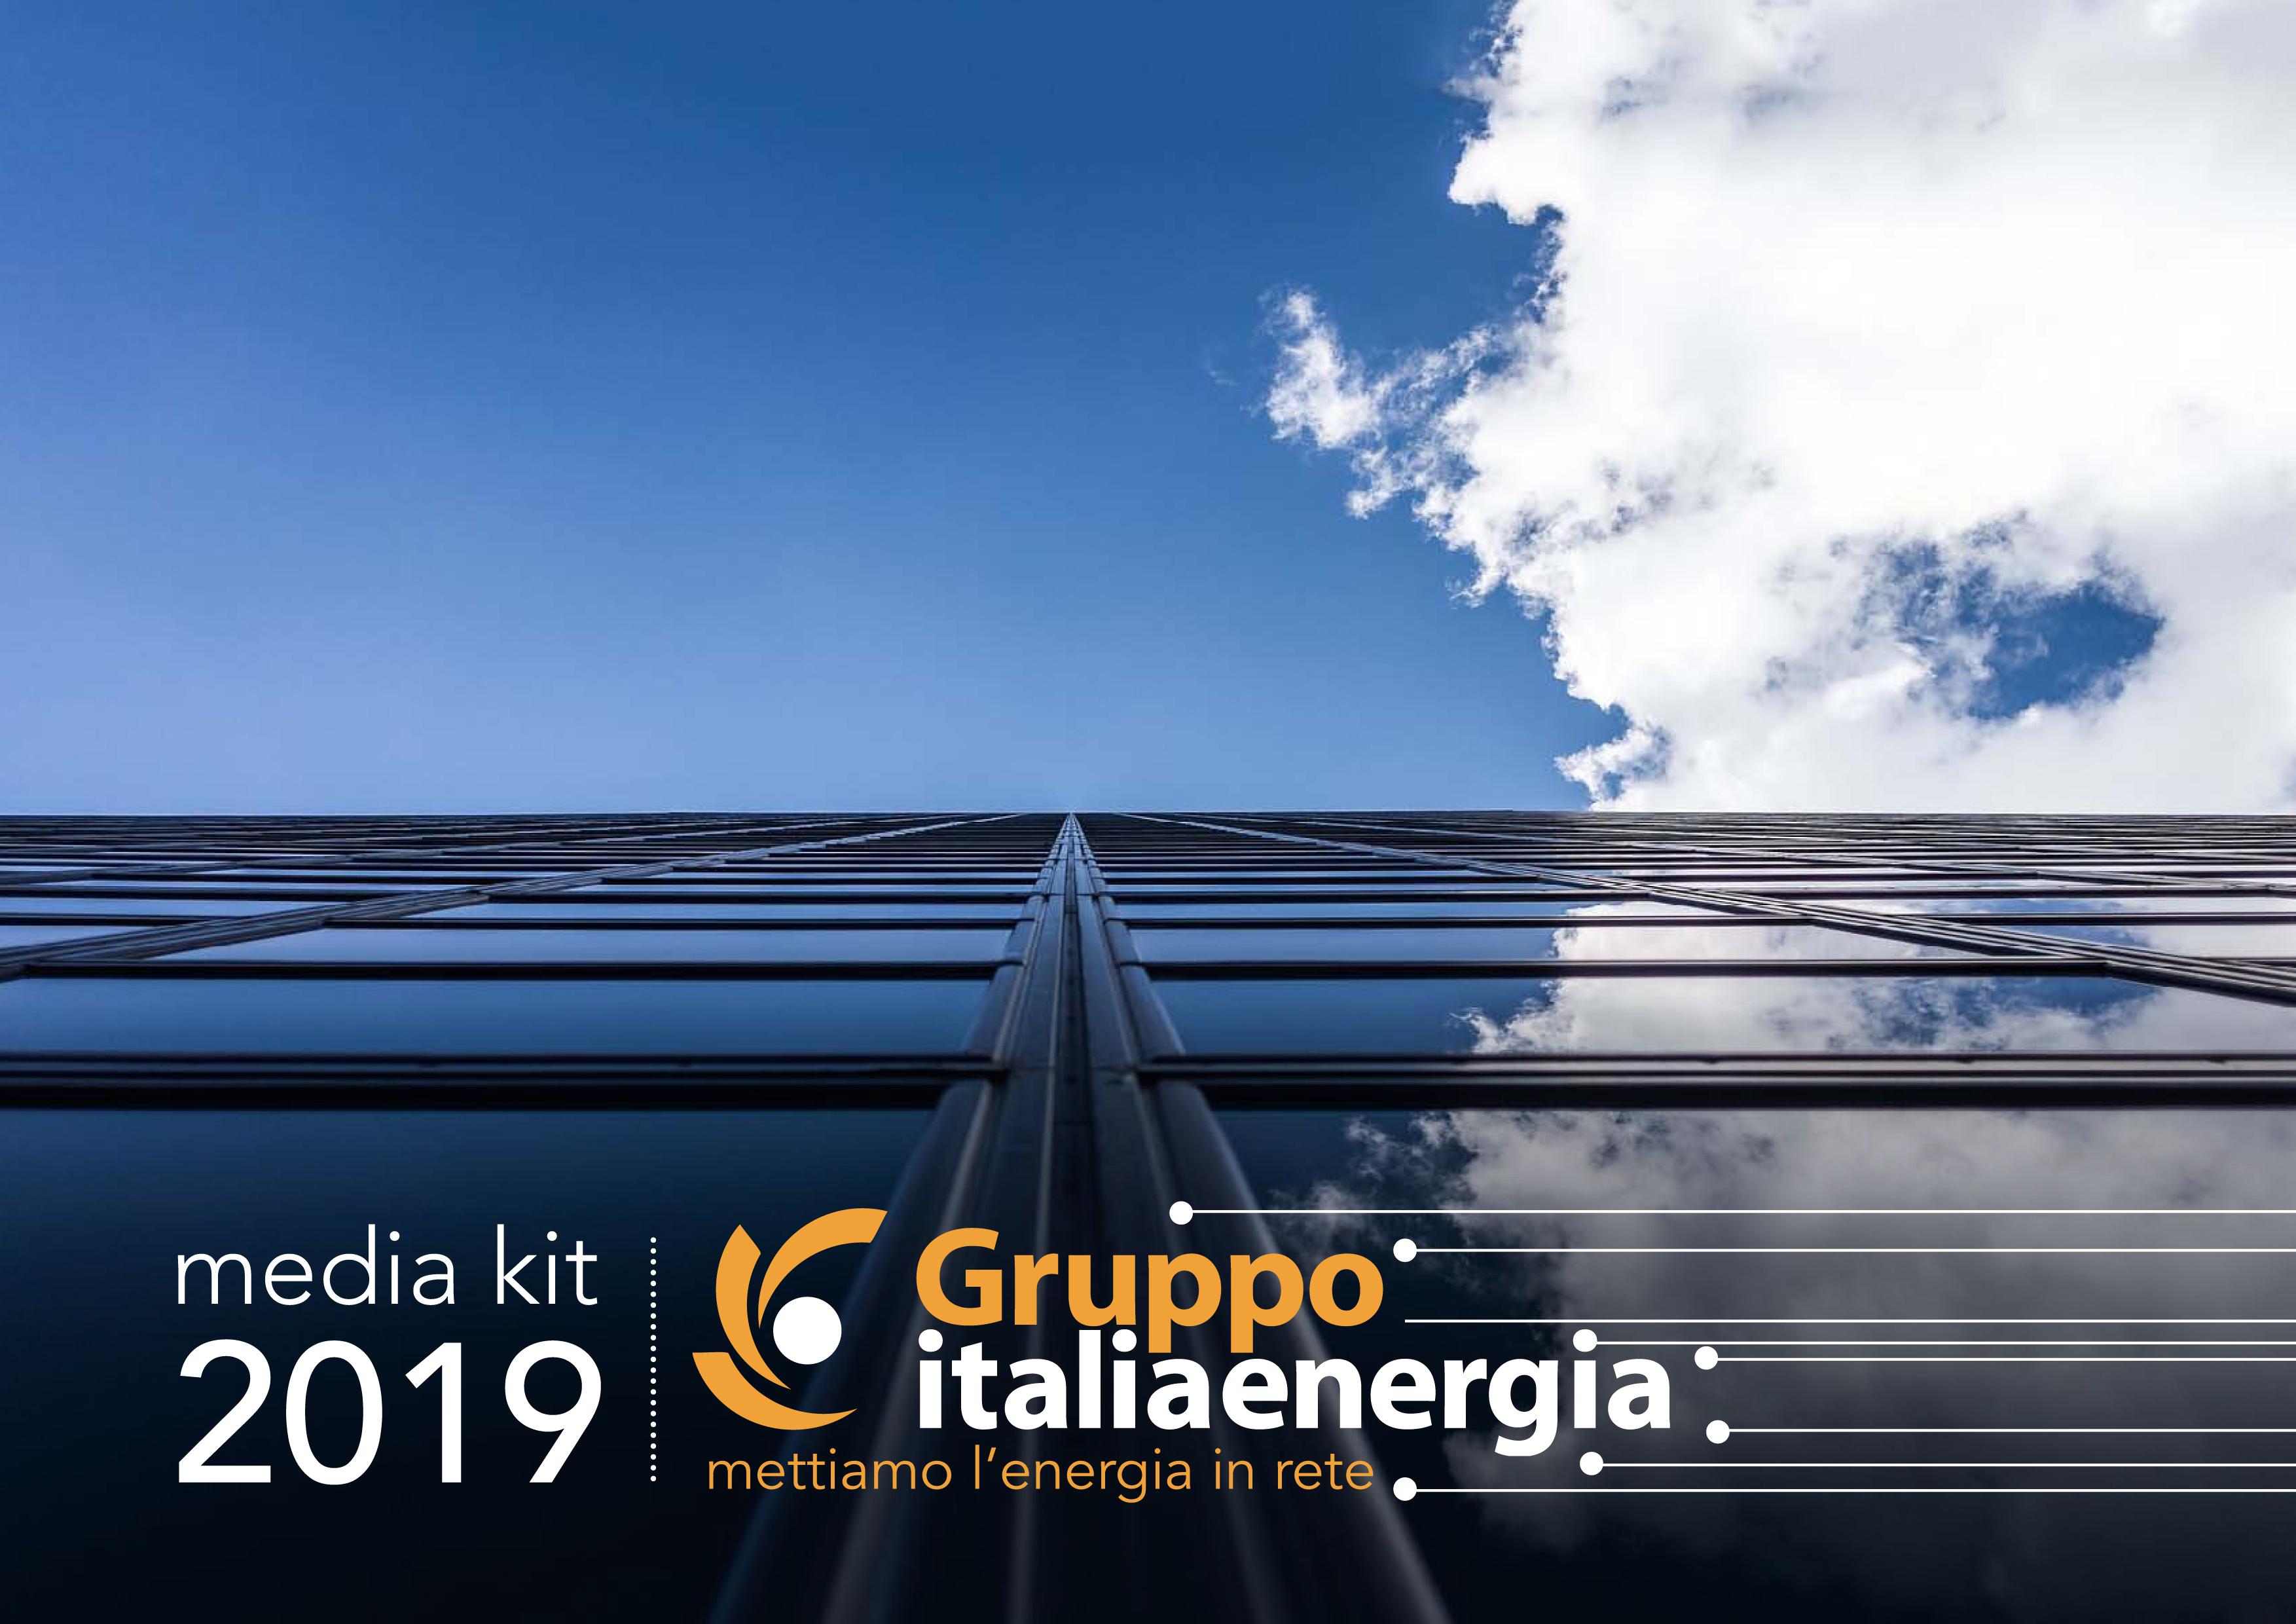 Media Kit 2019 Ita 1